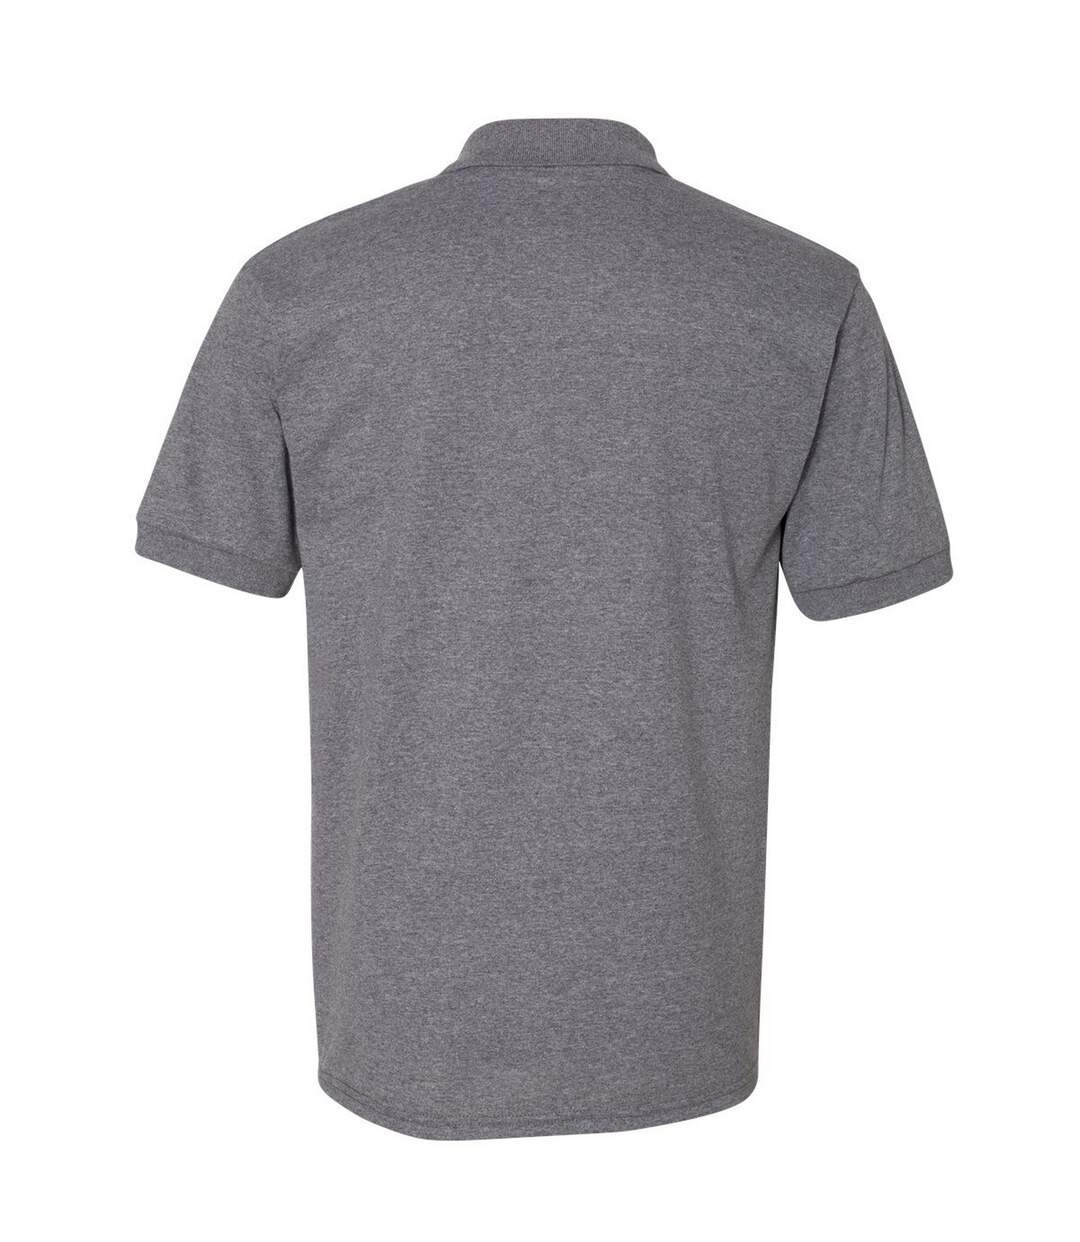 Gildan Adult DryBlend Jersey Short Sleeve Polo Shirt (Graphite Heather) - UTBC496